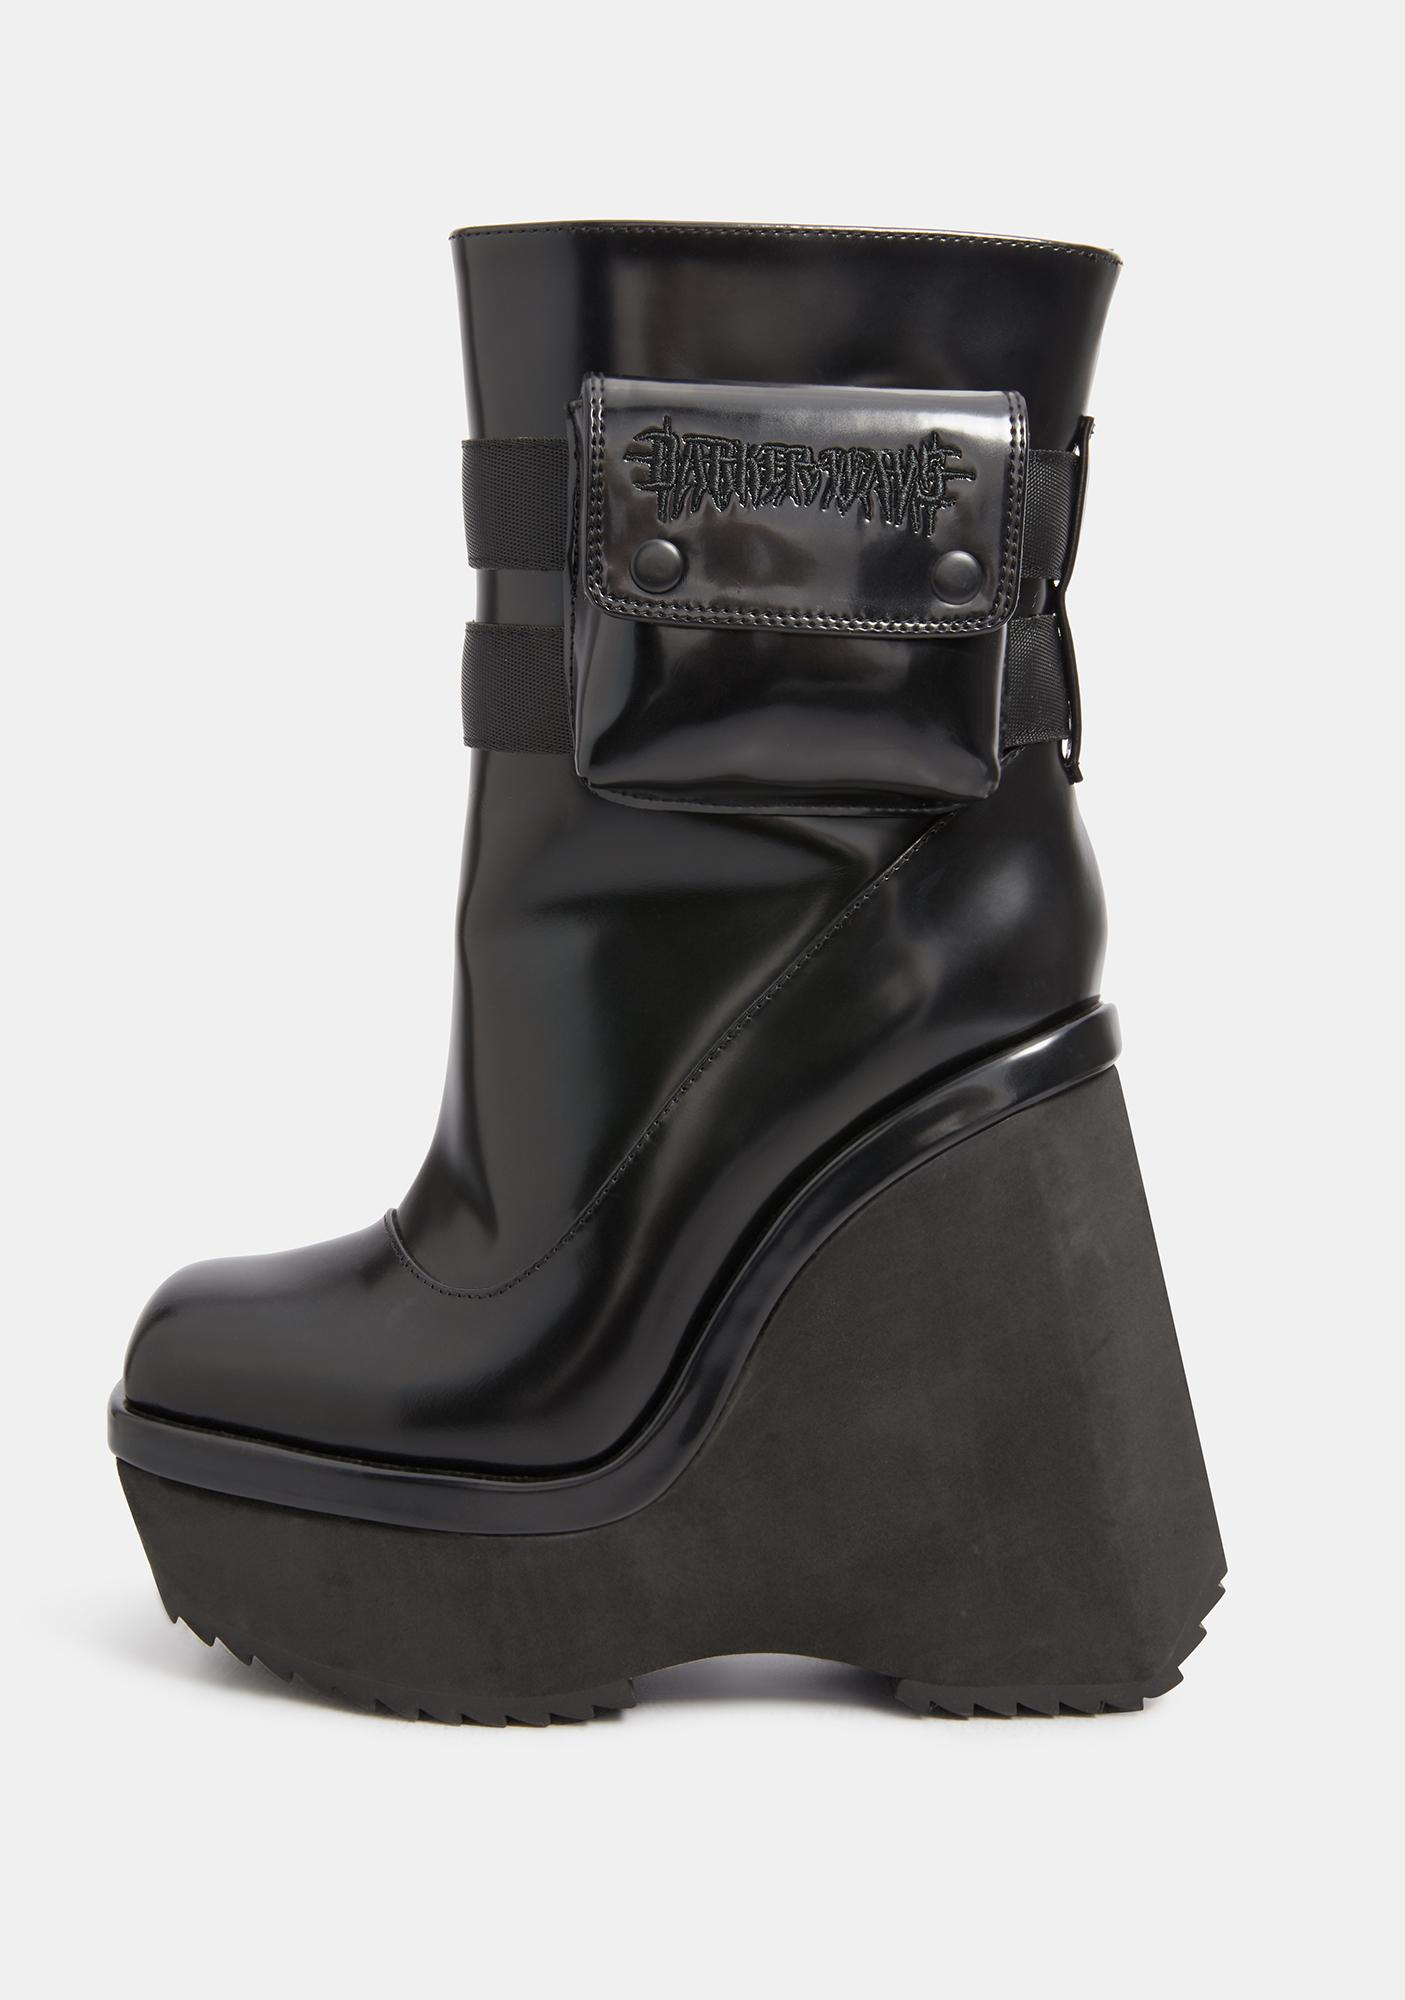 DARKER WAVS Kickdrum Leather Pocket Platform Wedge Boots